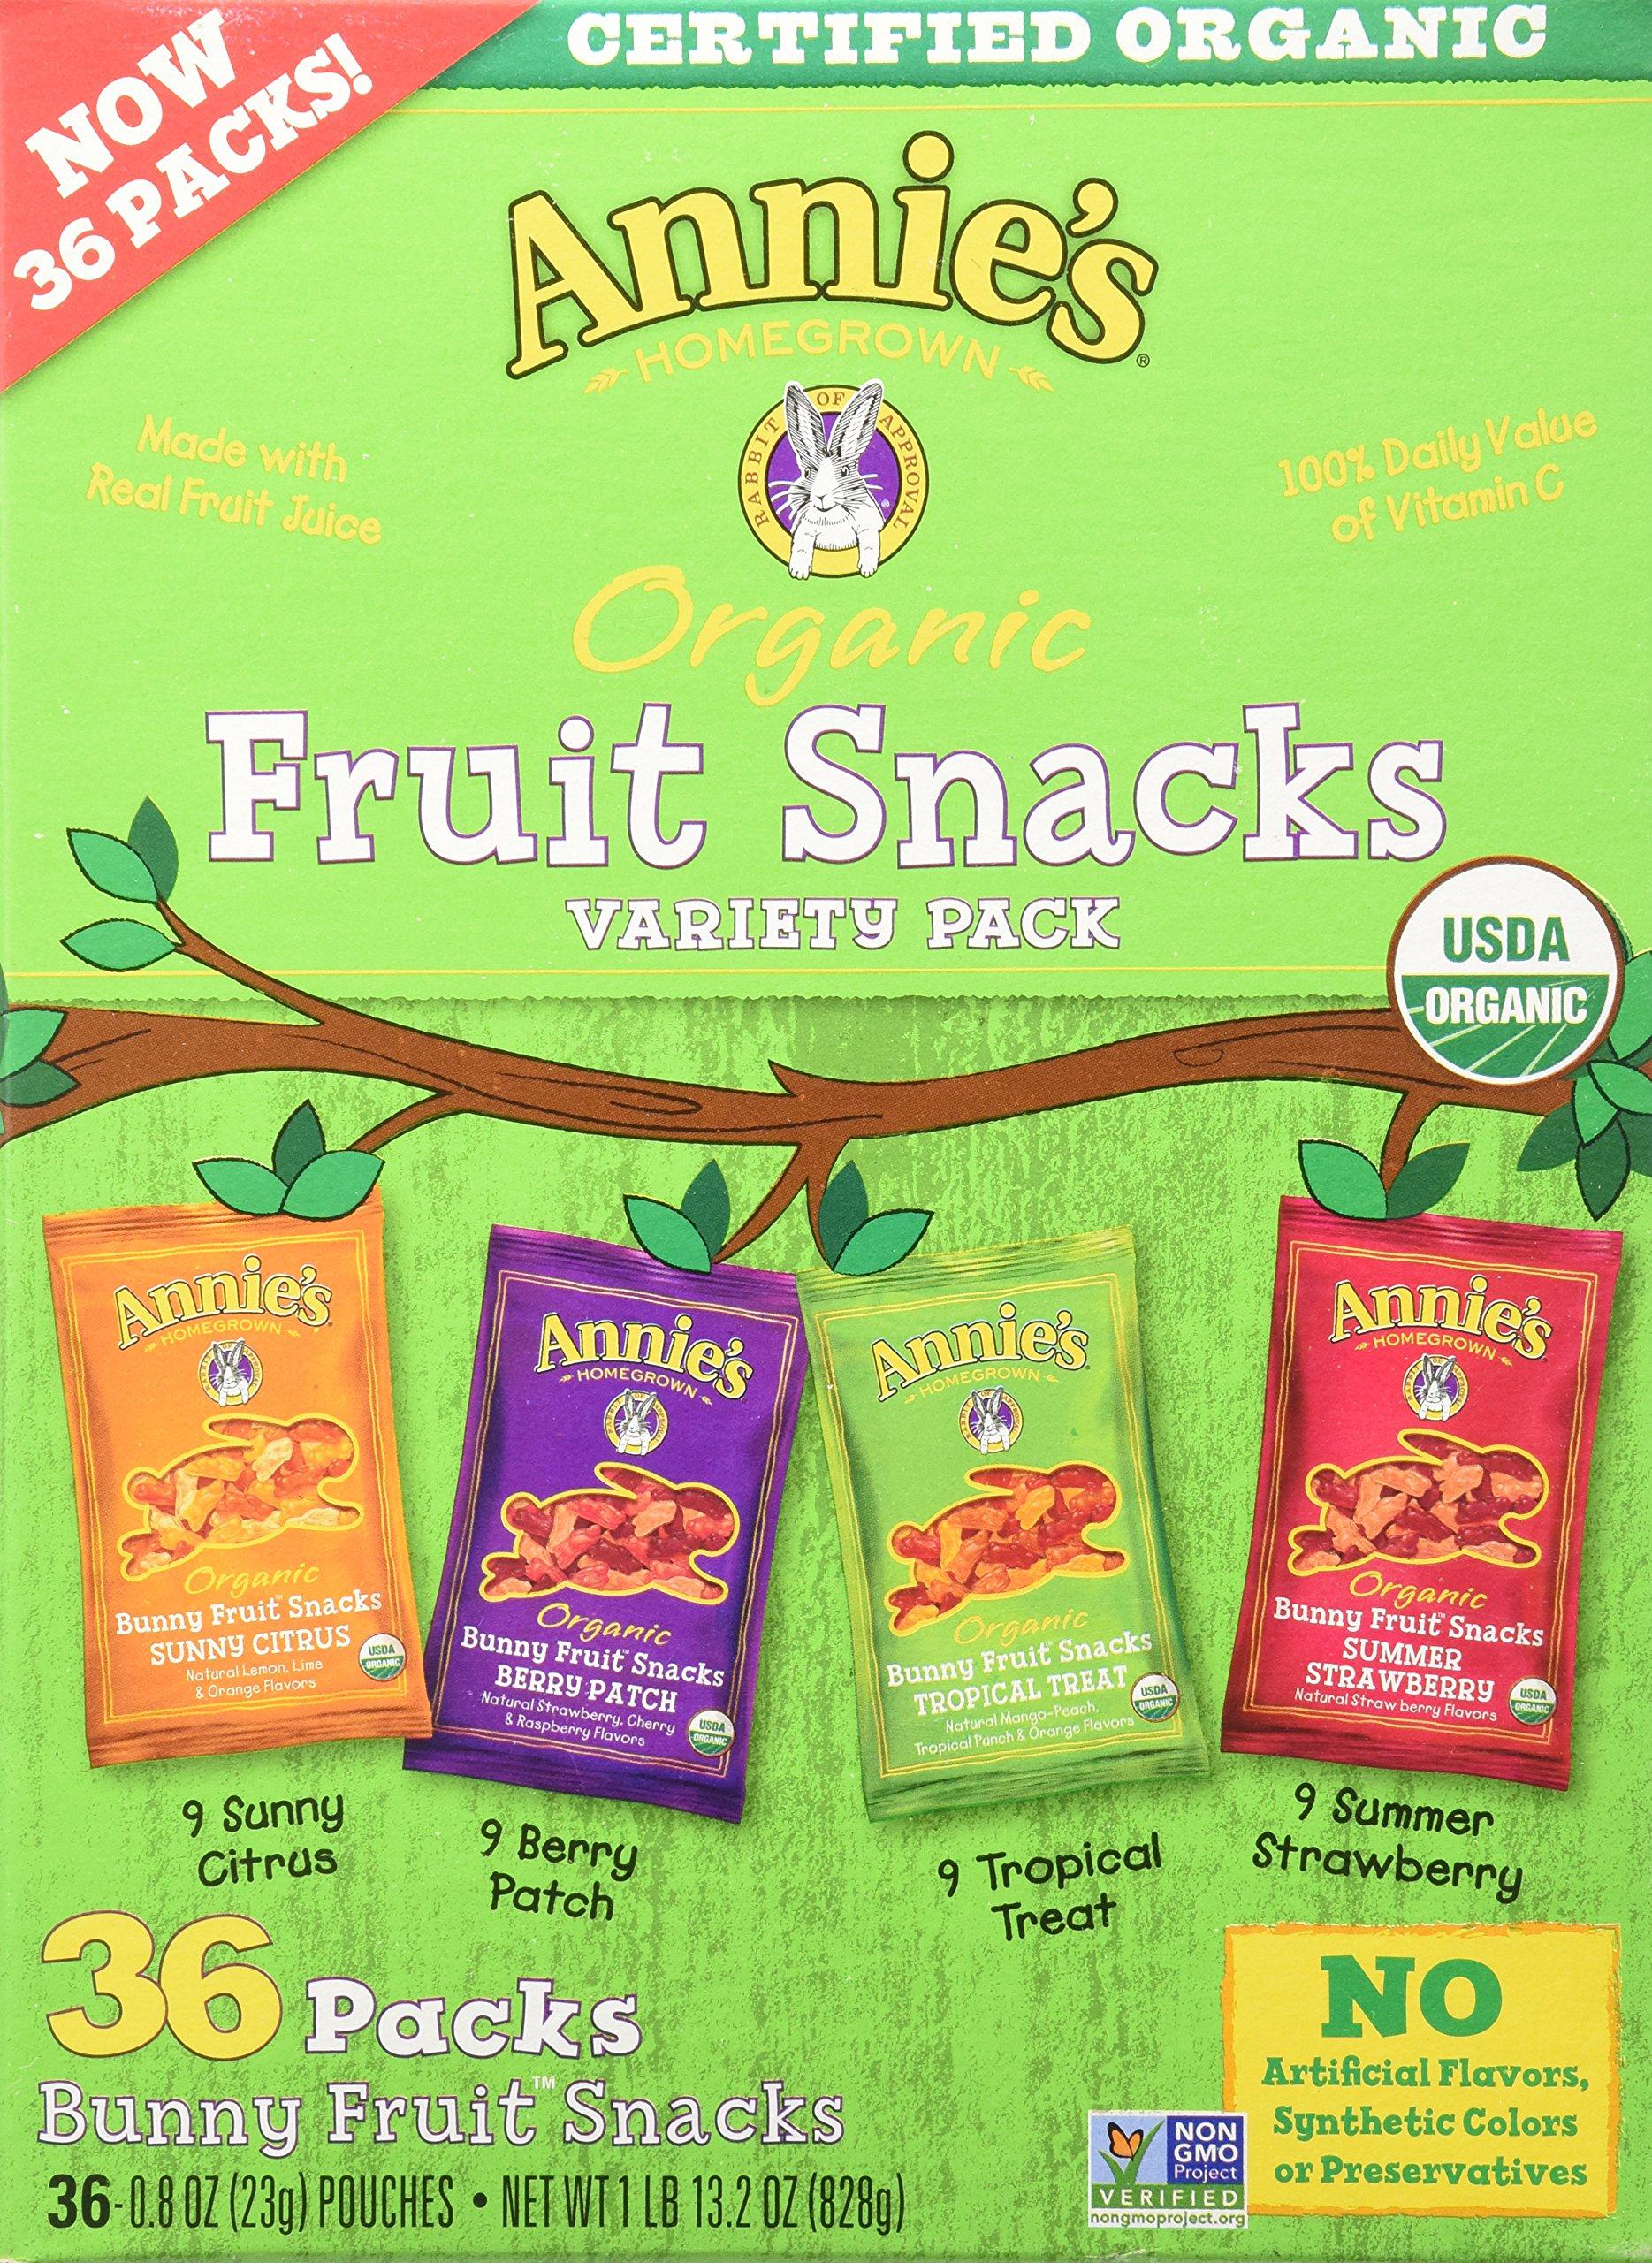 Annie's Homegrown Organic Vegan Fruit Snacks Variety Pack 36 Pouches - .8 Oz. Each